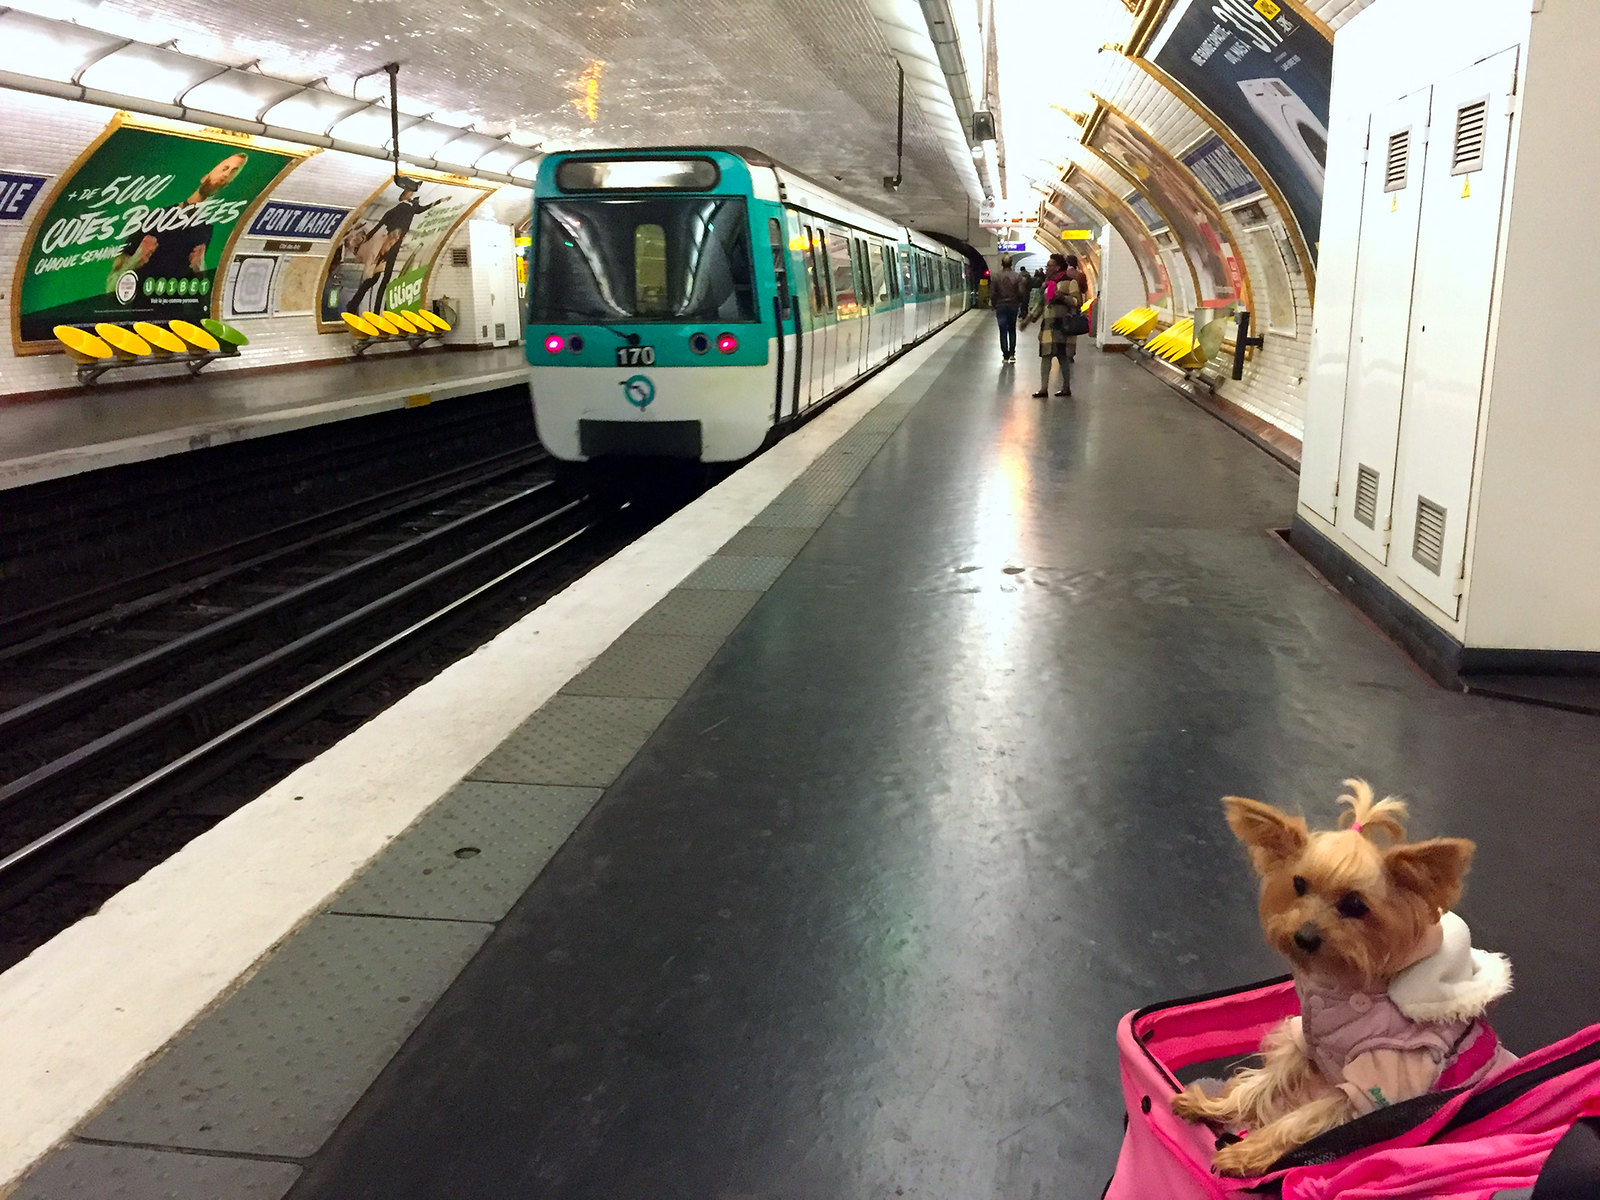 Viajar a Paris con Perro viajar a paris con perro - 34471059871 60e2ea98b6 h - Viajar a Paris con perro